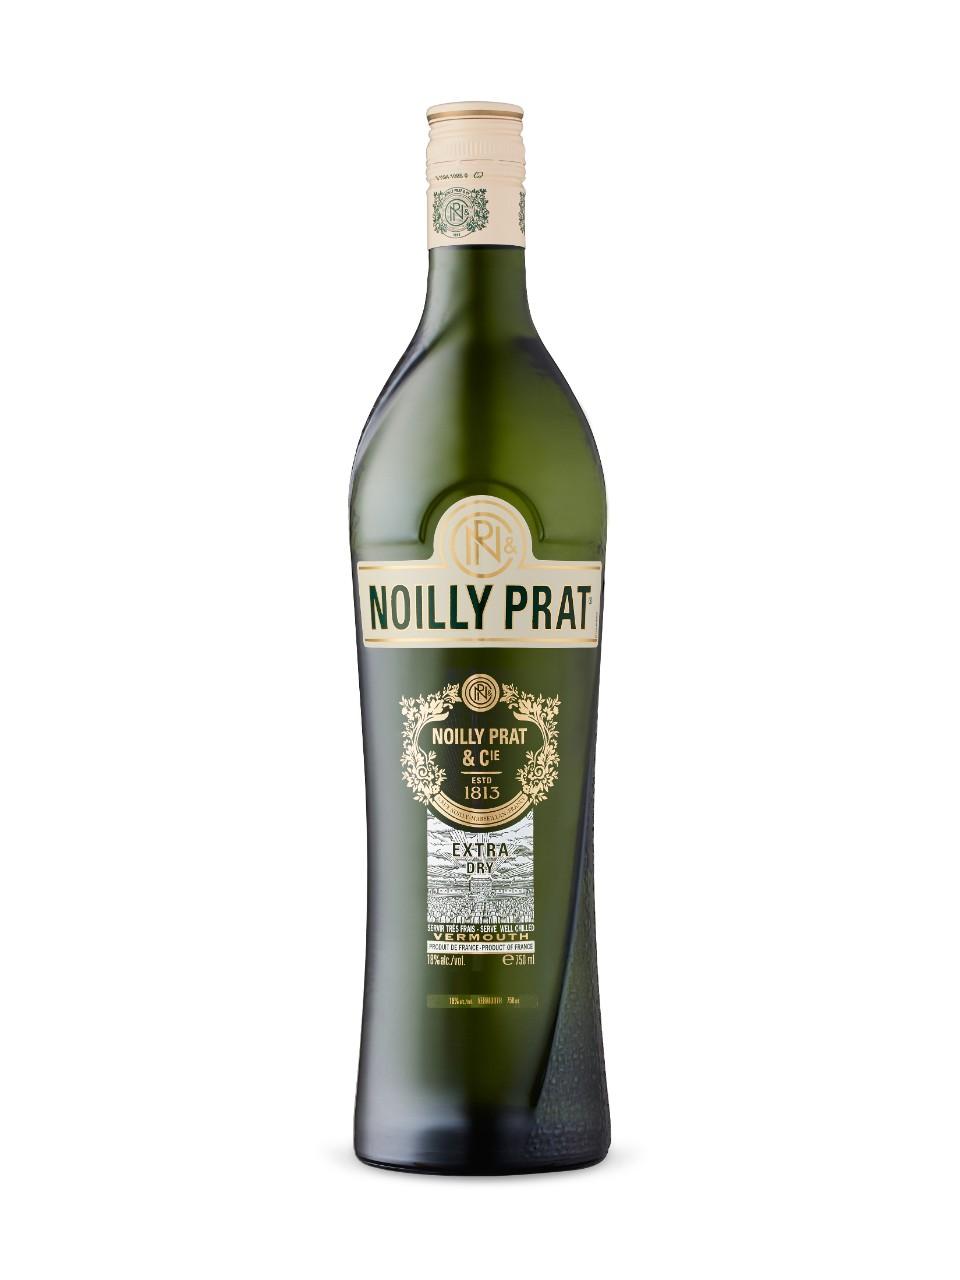 Noilly Prat: the go-to white.